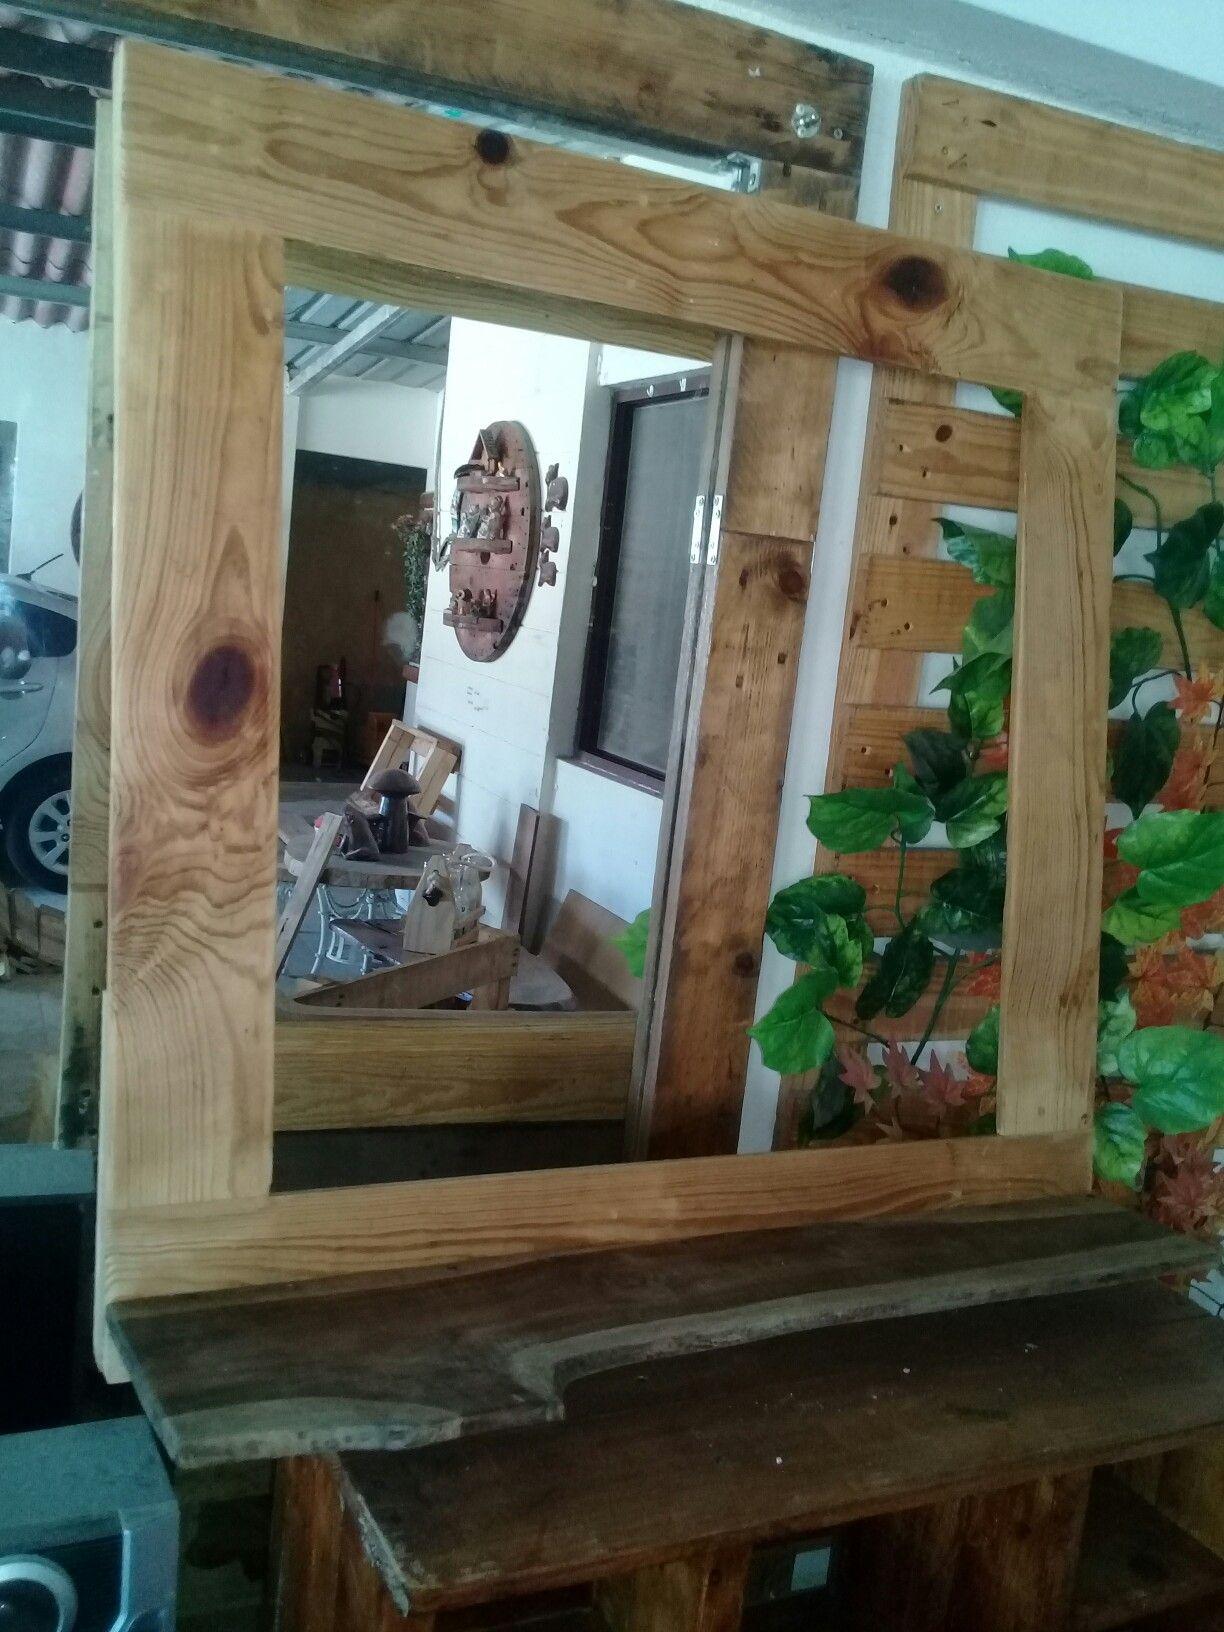 Marco de espejo de palets y repisa de tronco de teca | pallest leon ...